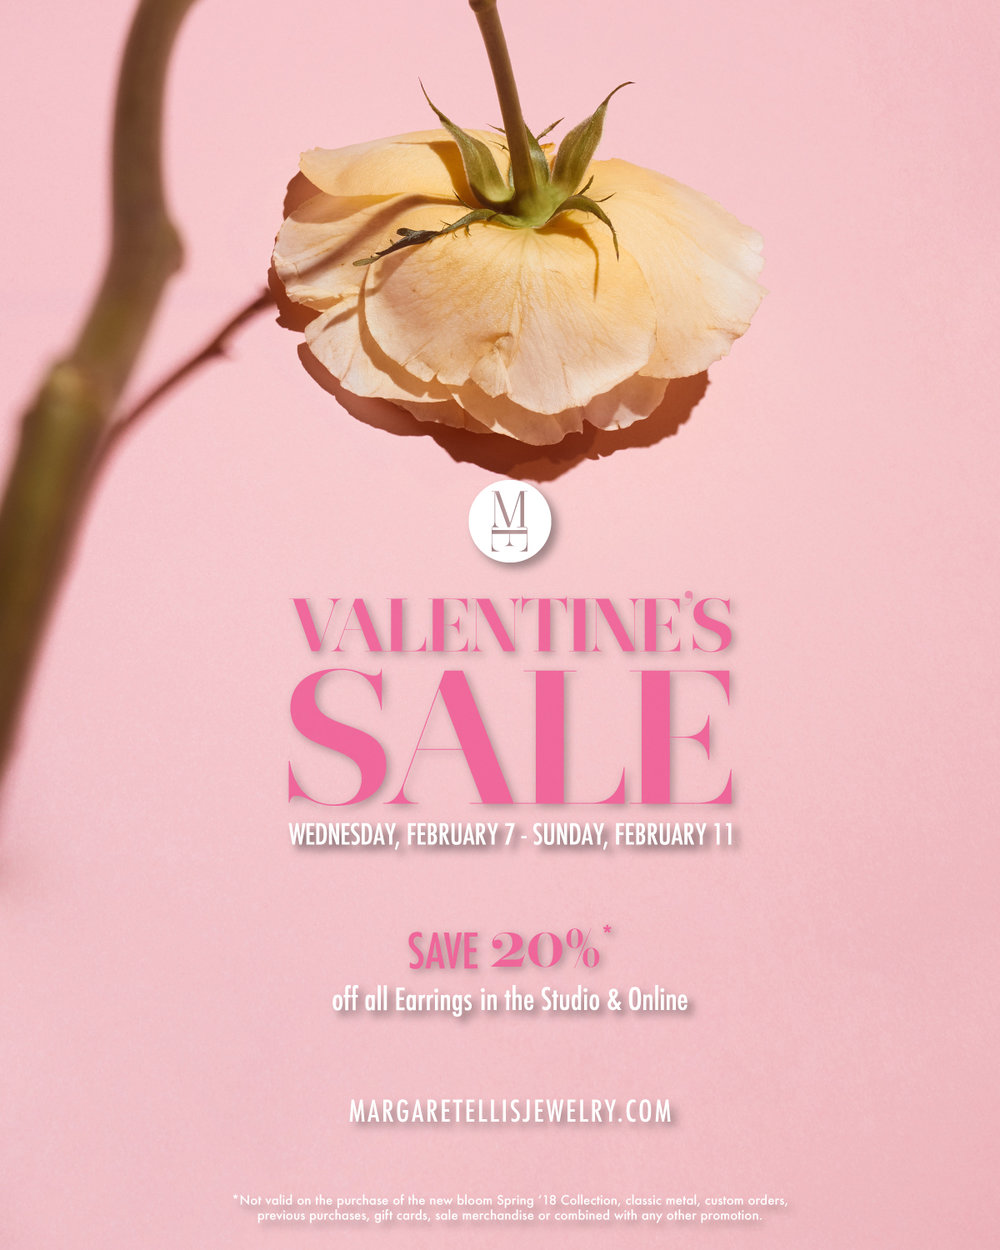 ValentinesEmail.jpg